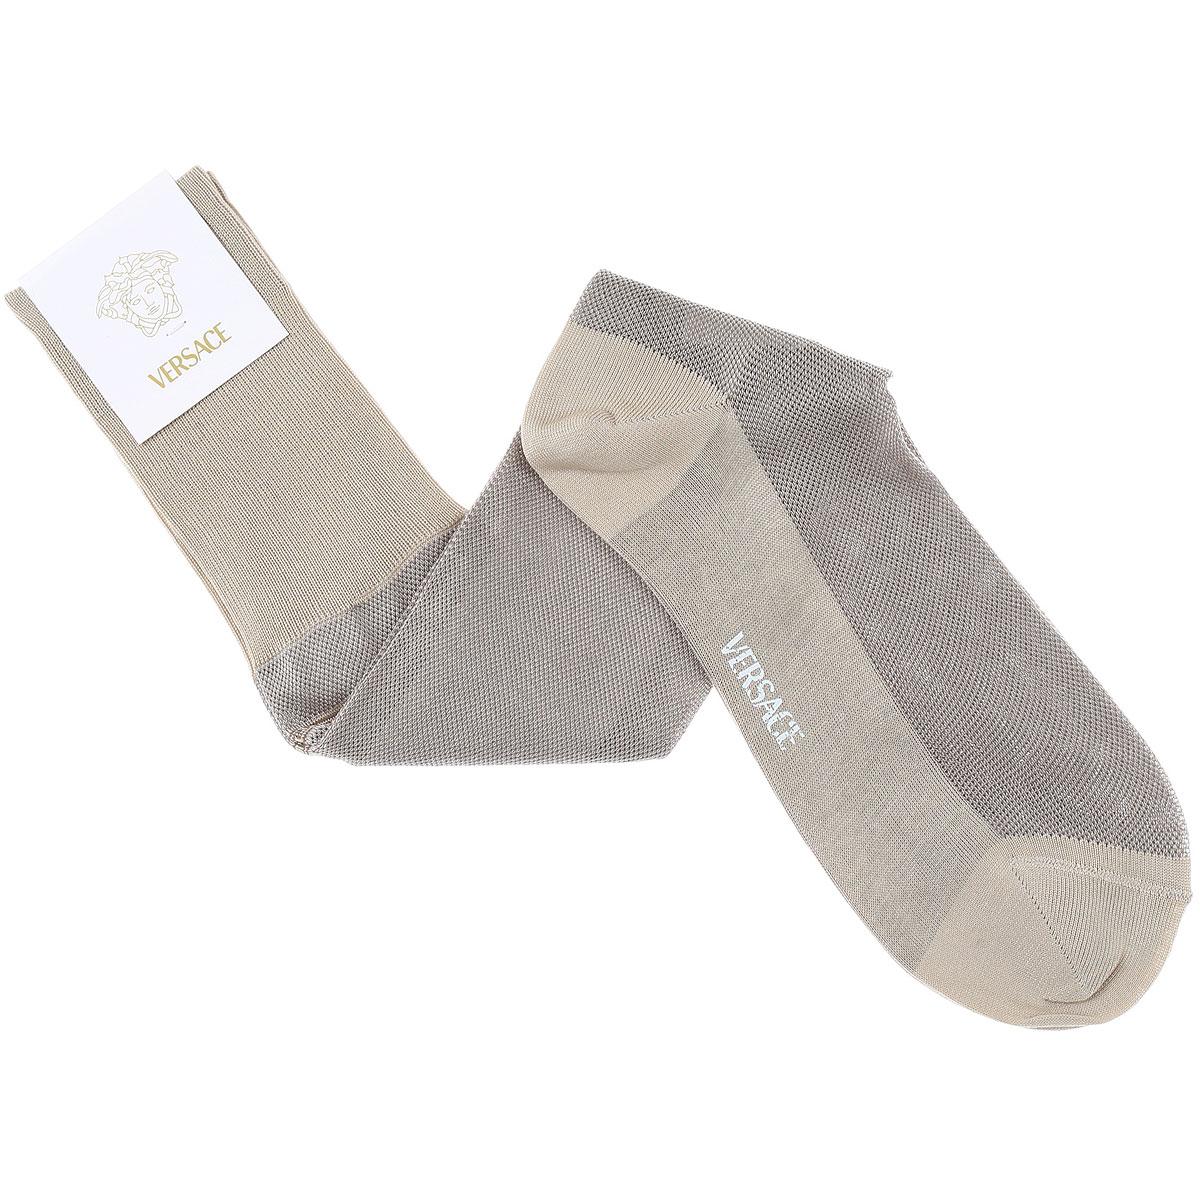 Versace Socks Socks for Men On Sale, Beige, Cotton, 2019, 11 (Shoe Size: EU 43 - US 9) 12 (Shoe Size: EU 44 - US 10)